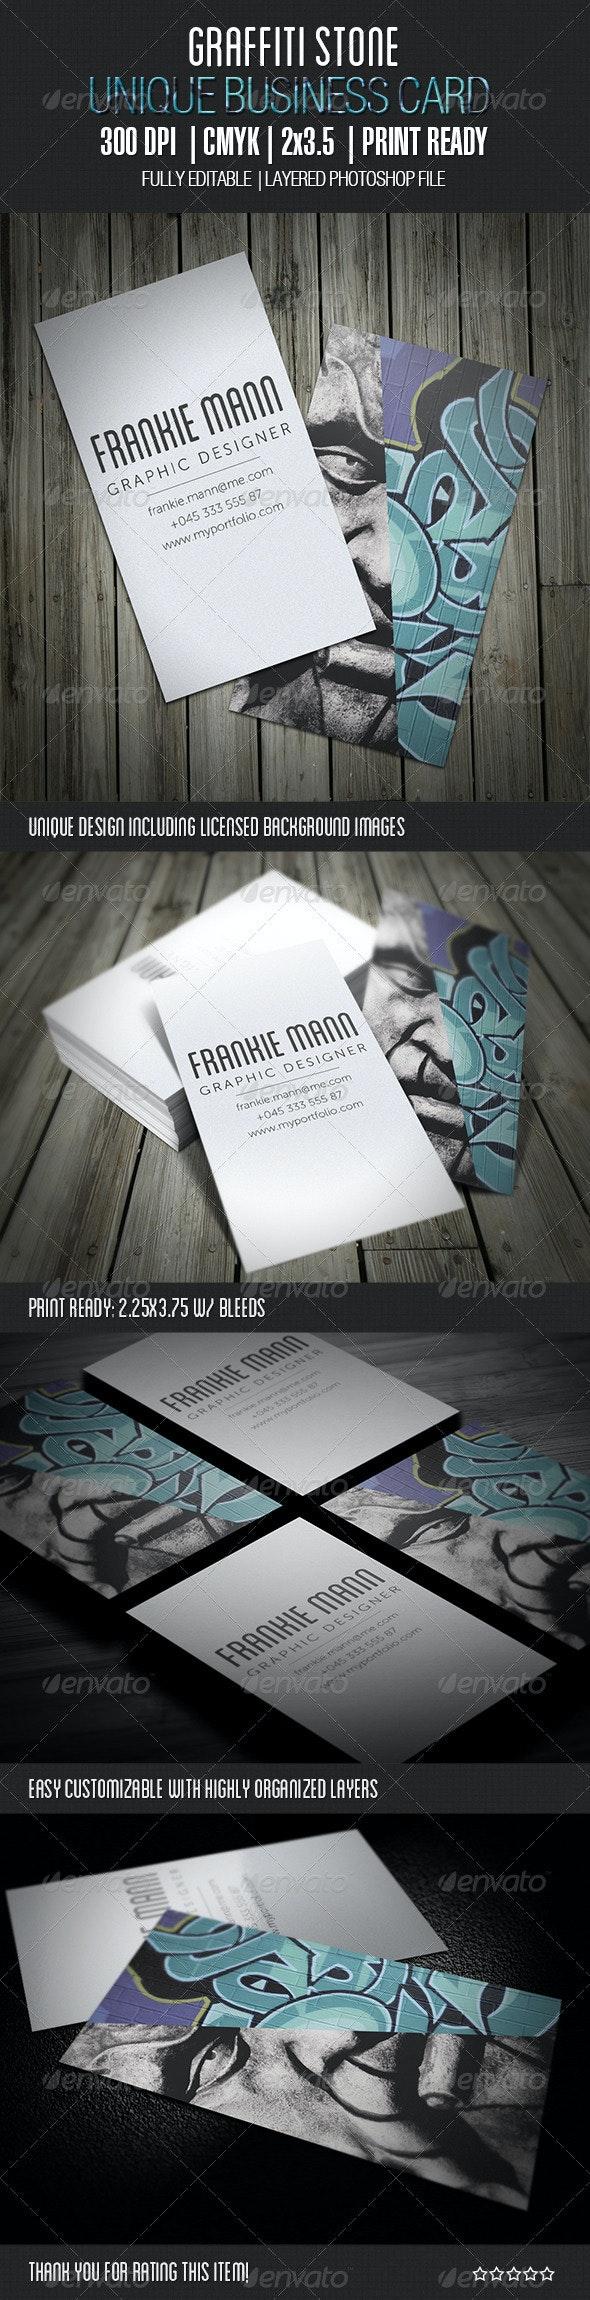 Graffiti Stone Business Card - Creative Business Cards